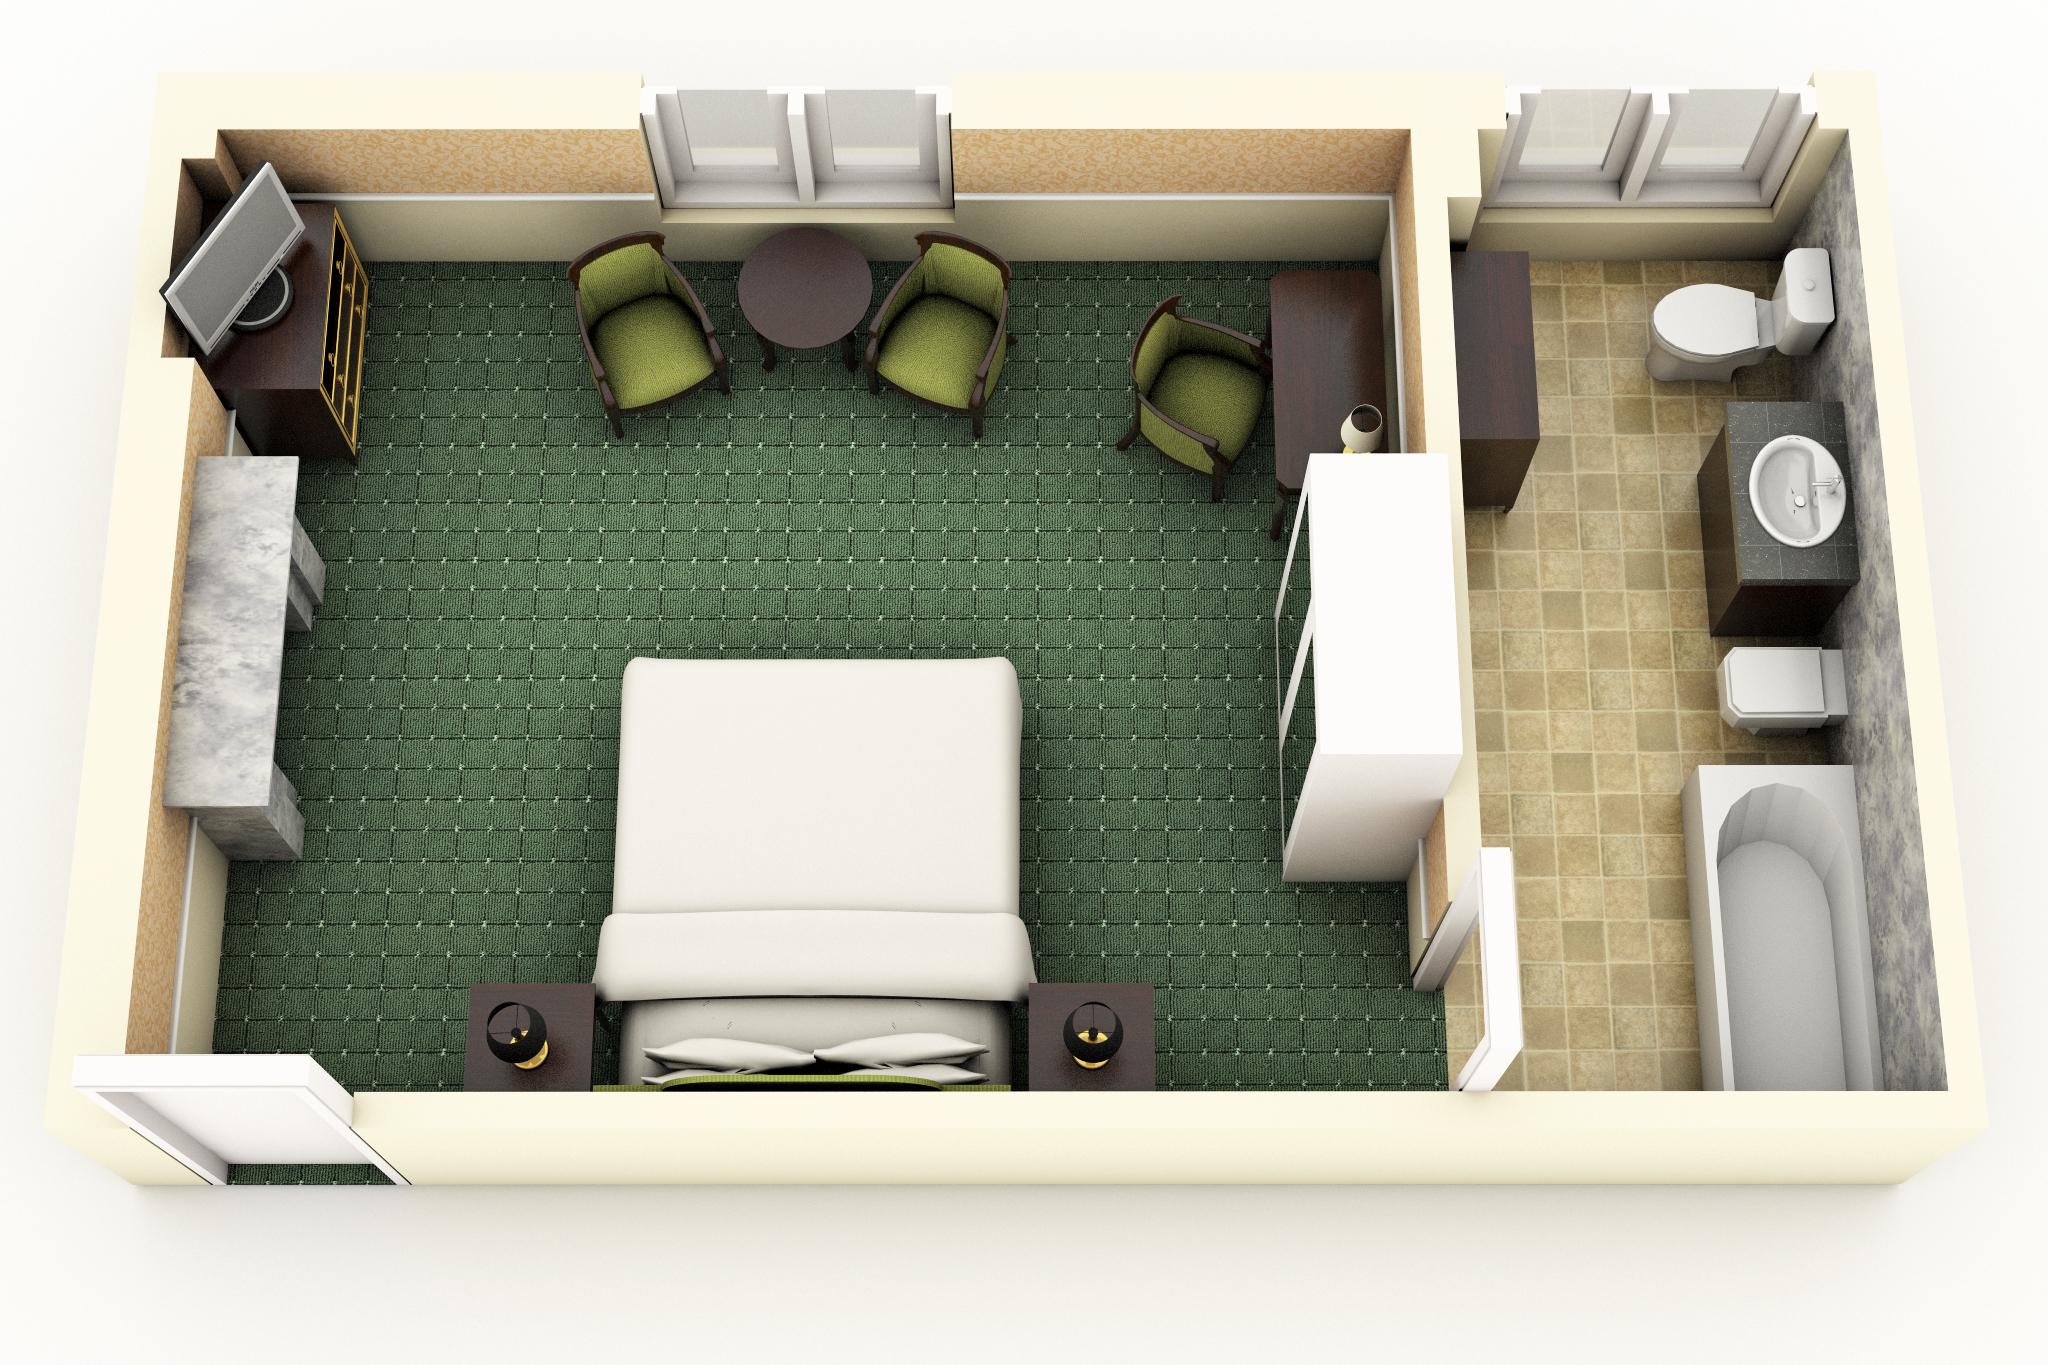 Deluxe Saint-Honoré Room floorplan